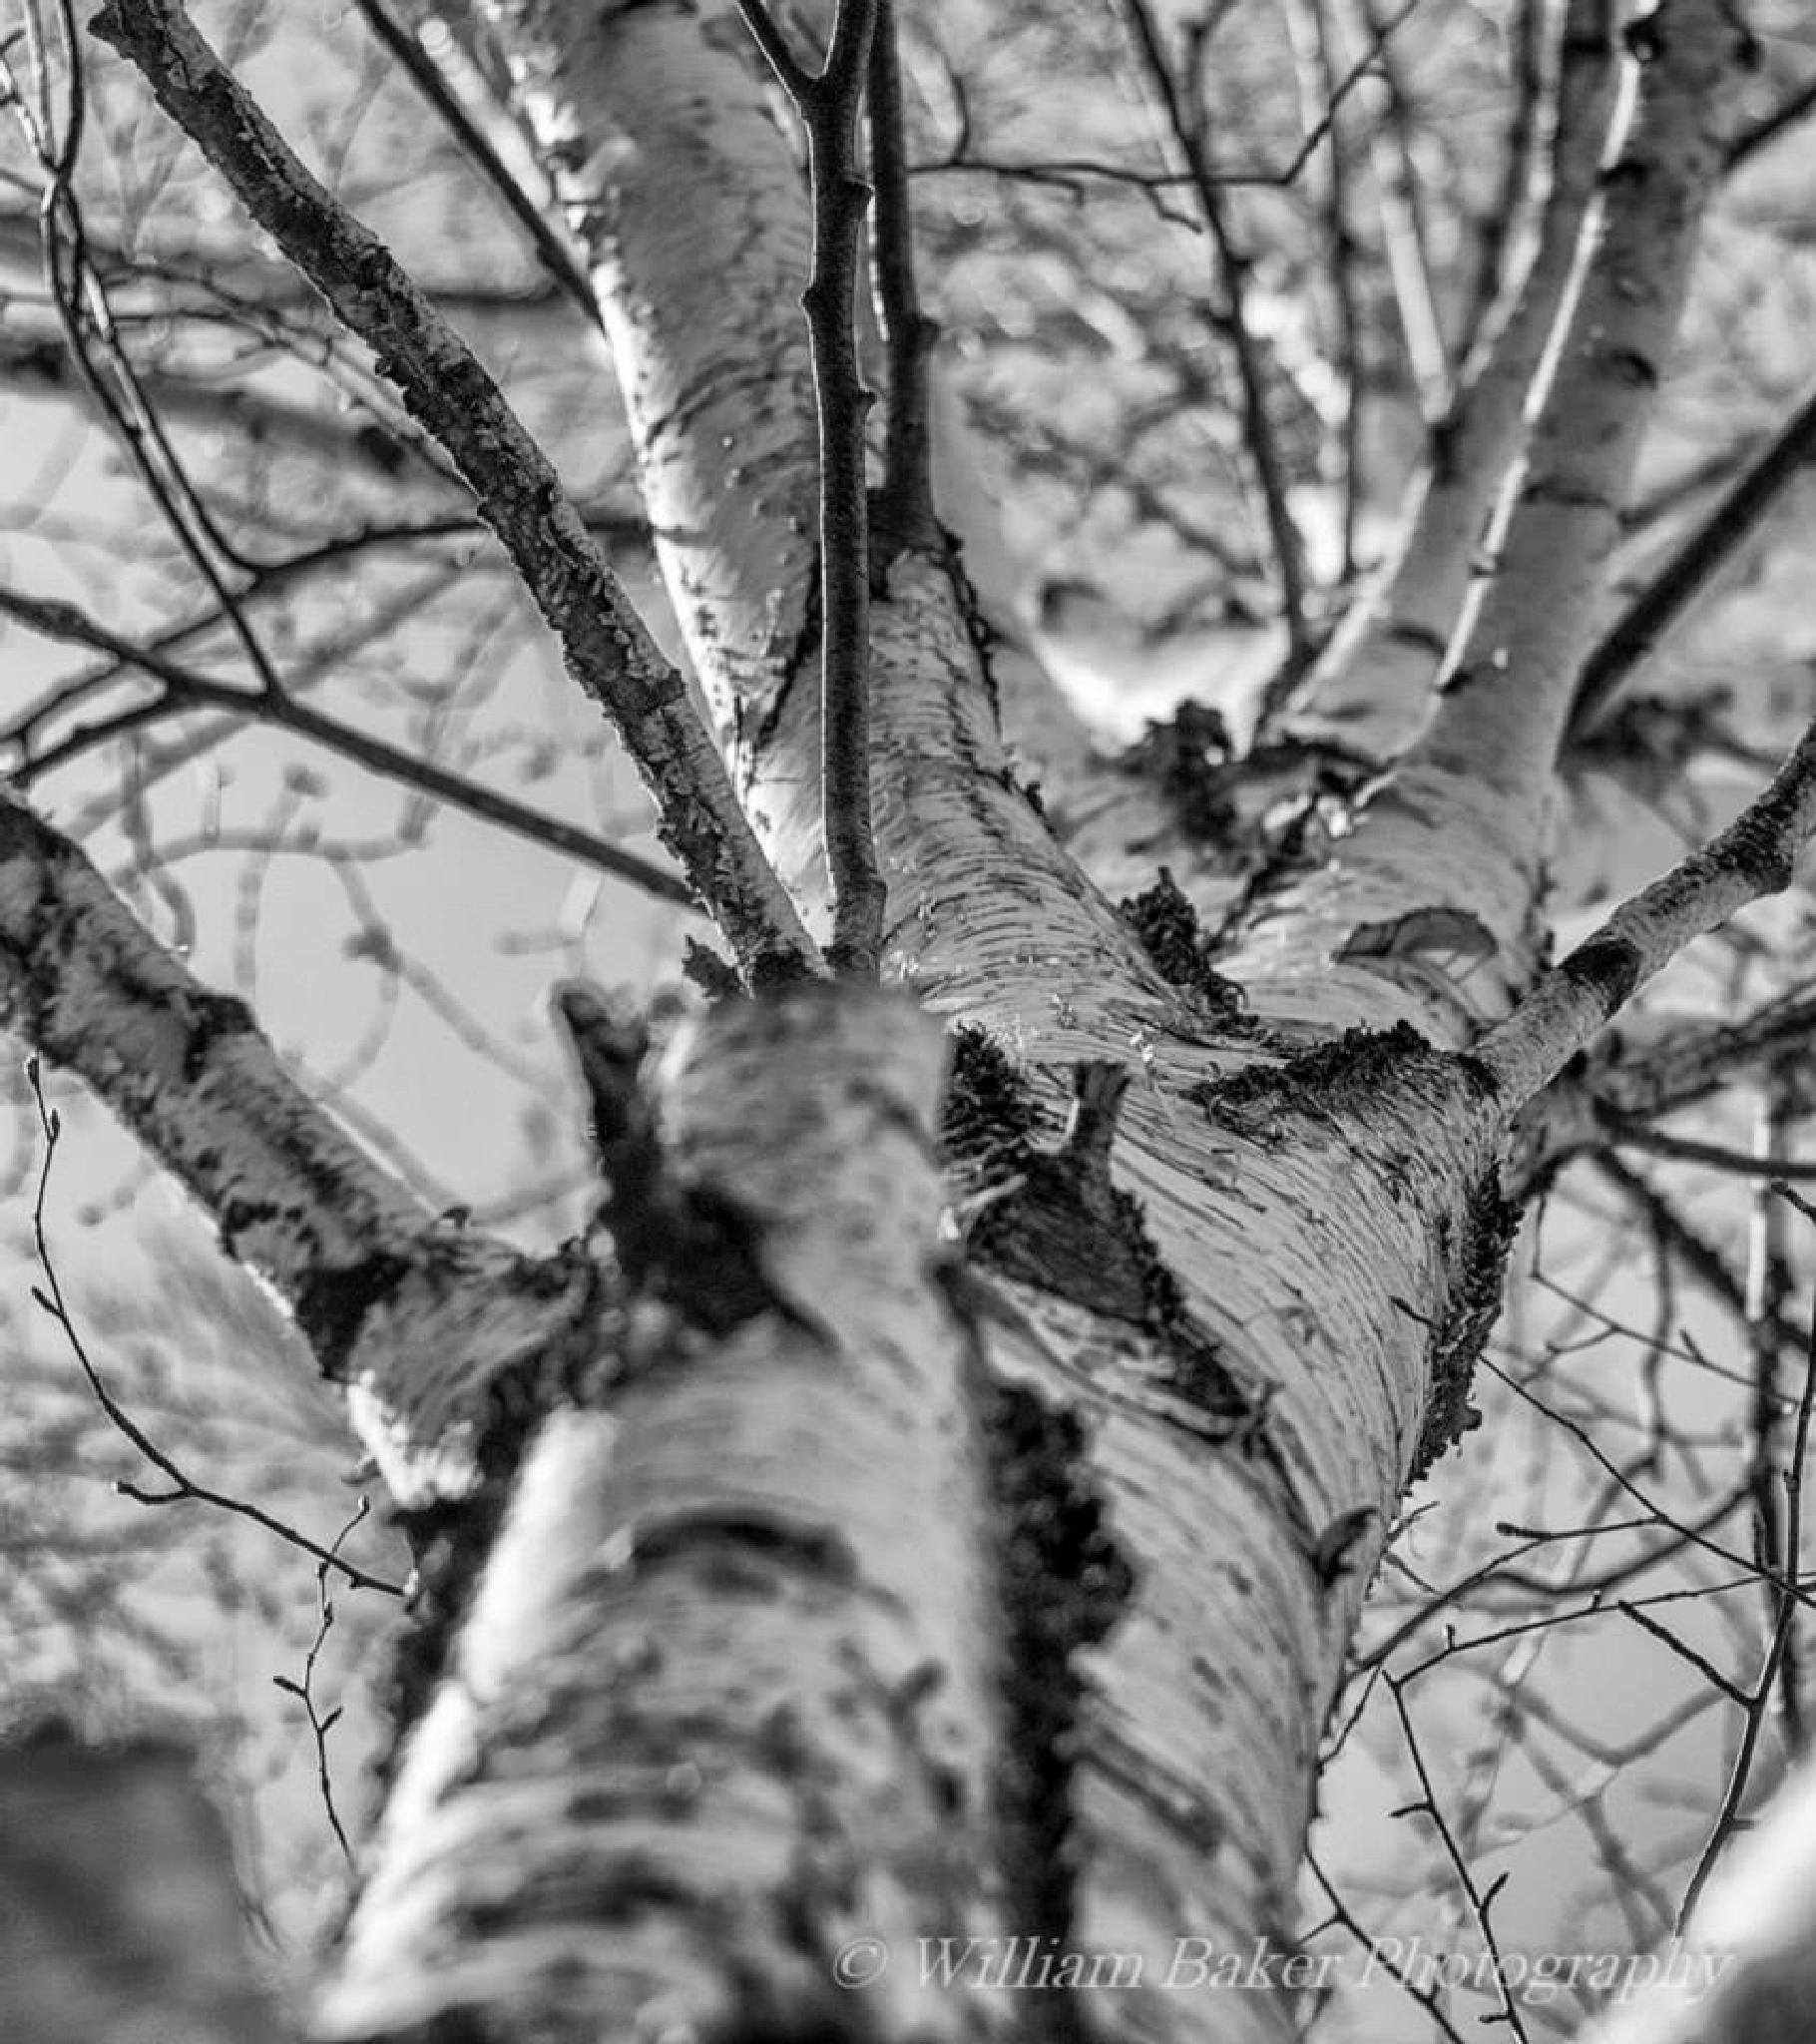 Winter Birch by william.baker.581